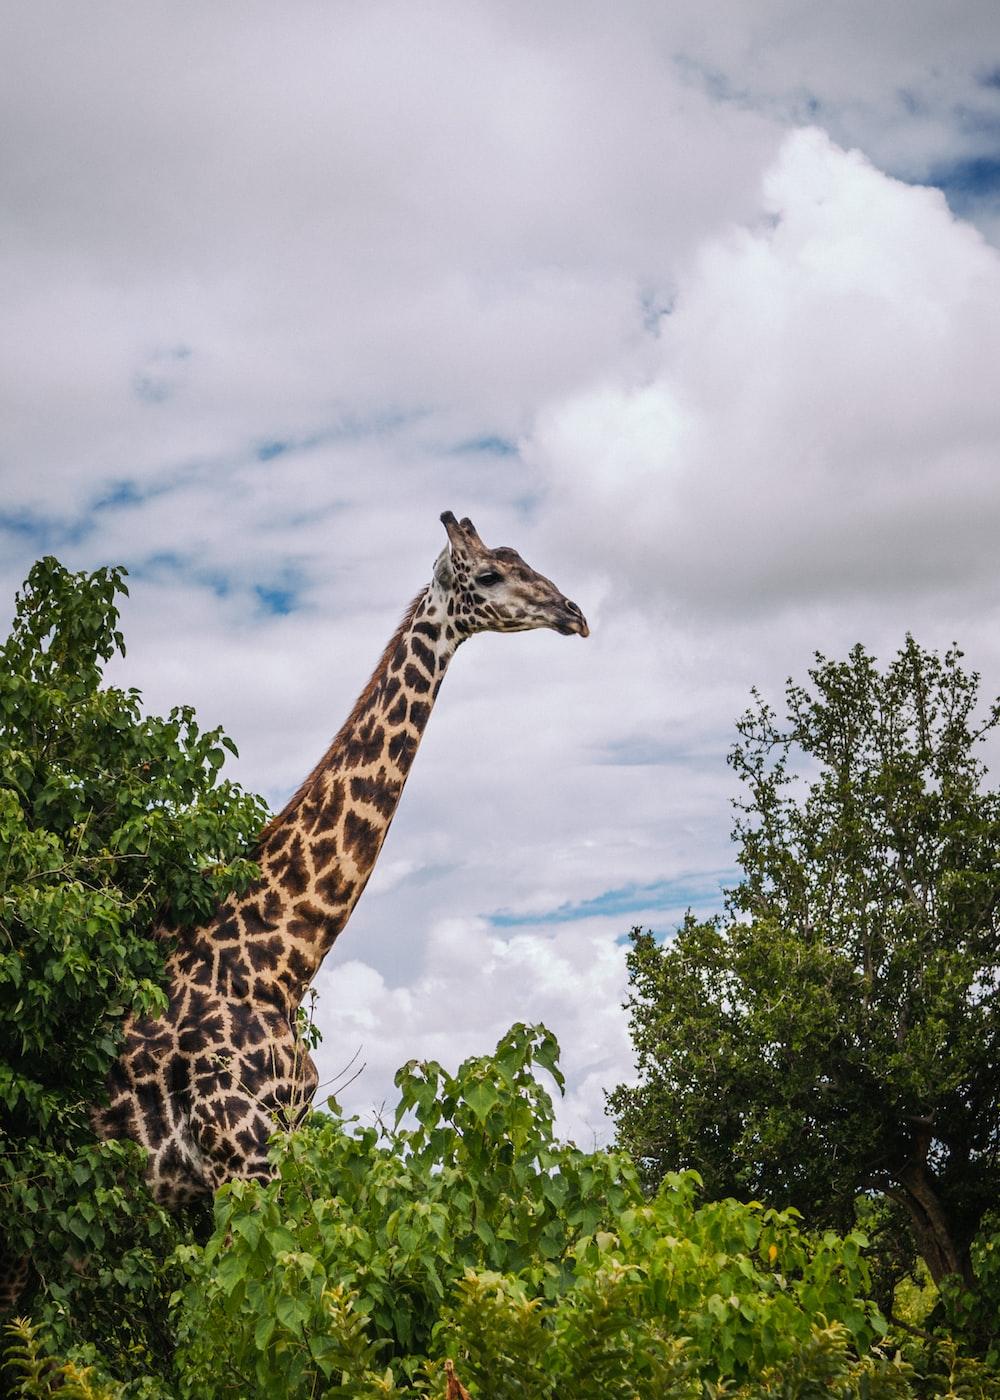 giraffe surround with trees